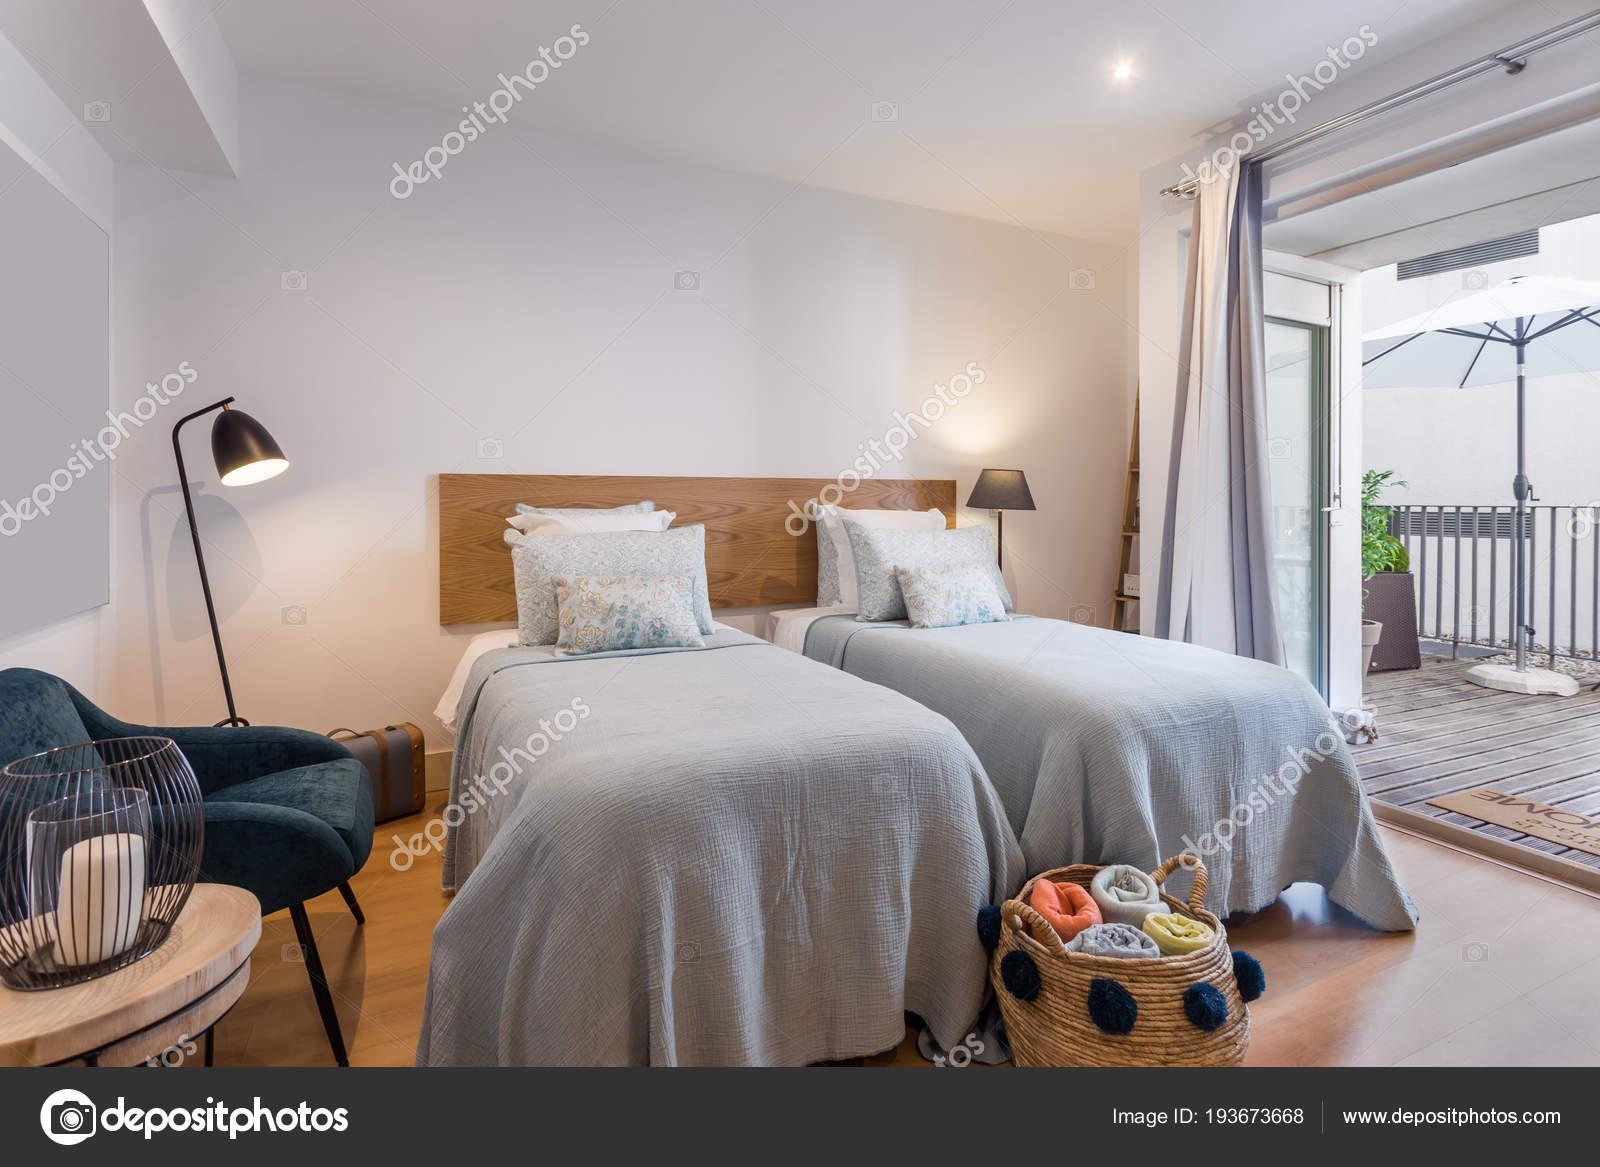 Casa moderna camera da letto singola con piccola cucina ...